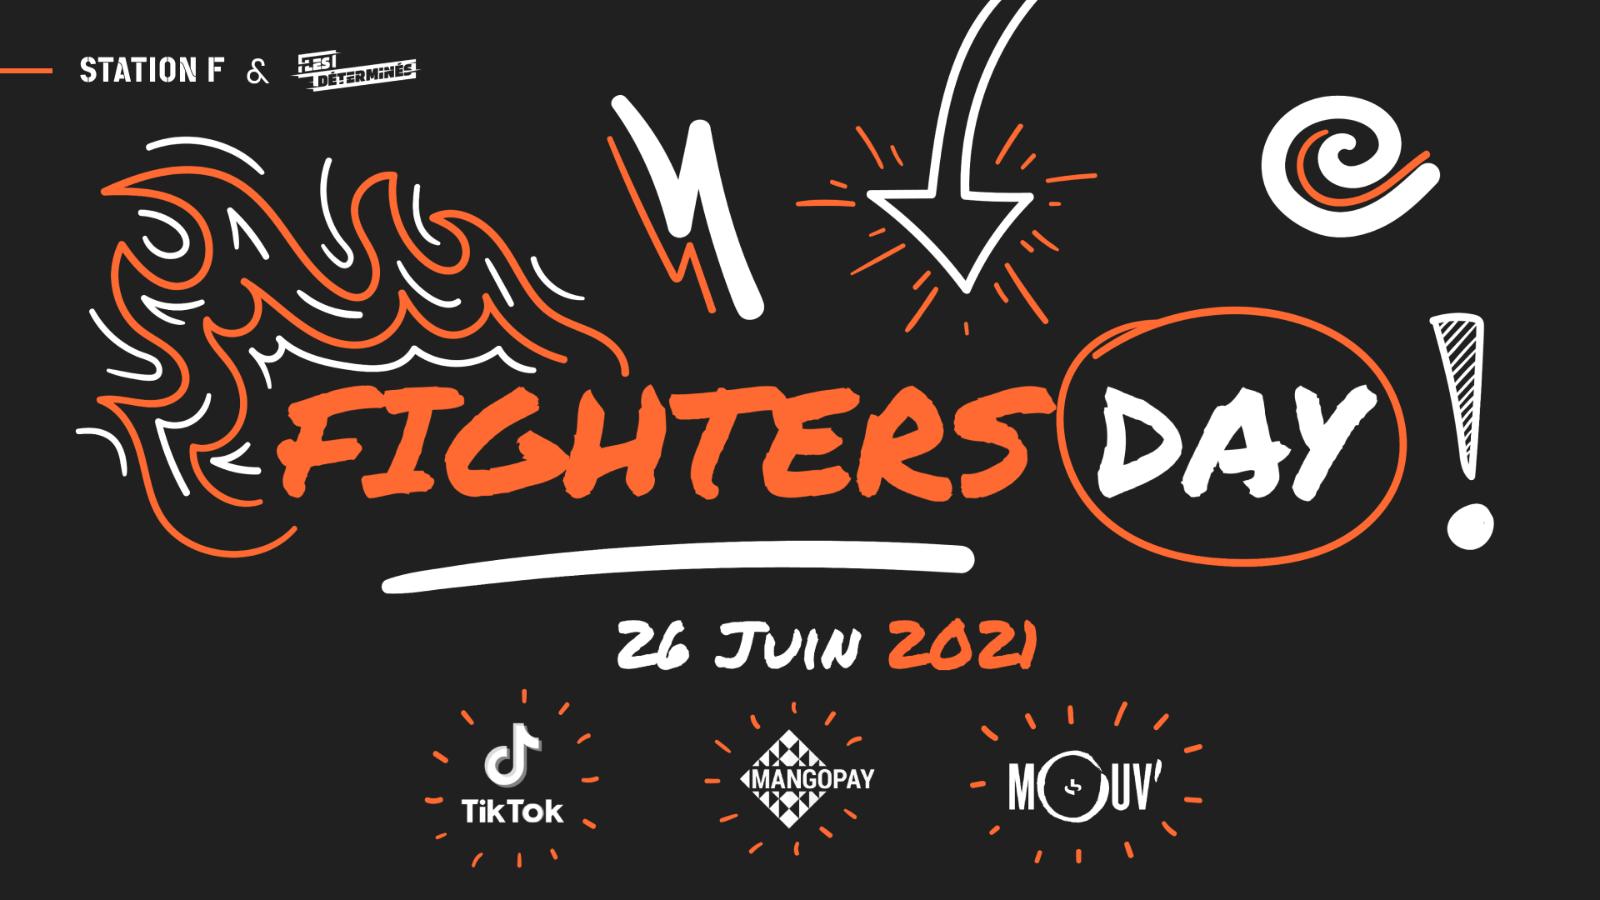 Thumbnail for news article called Xavier Niel, Moussa Camara et Olivier Rousteing participeront à Fighters Day à STATION F le 26 juin